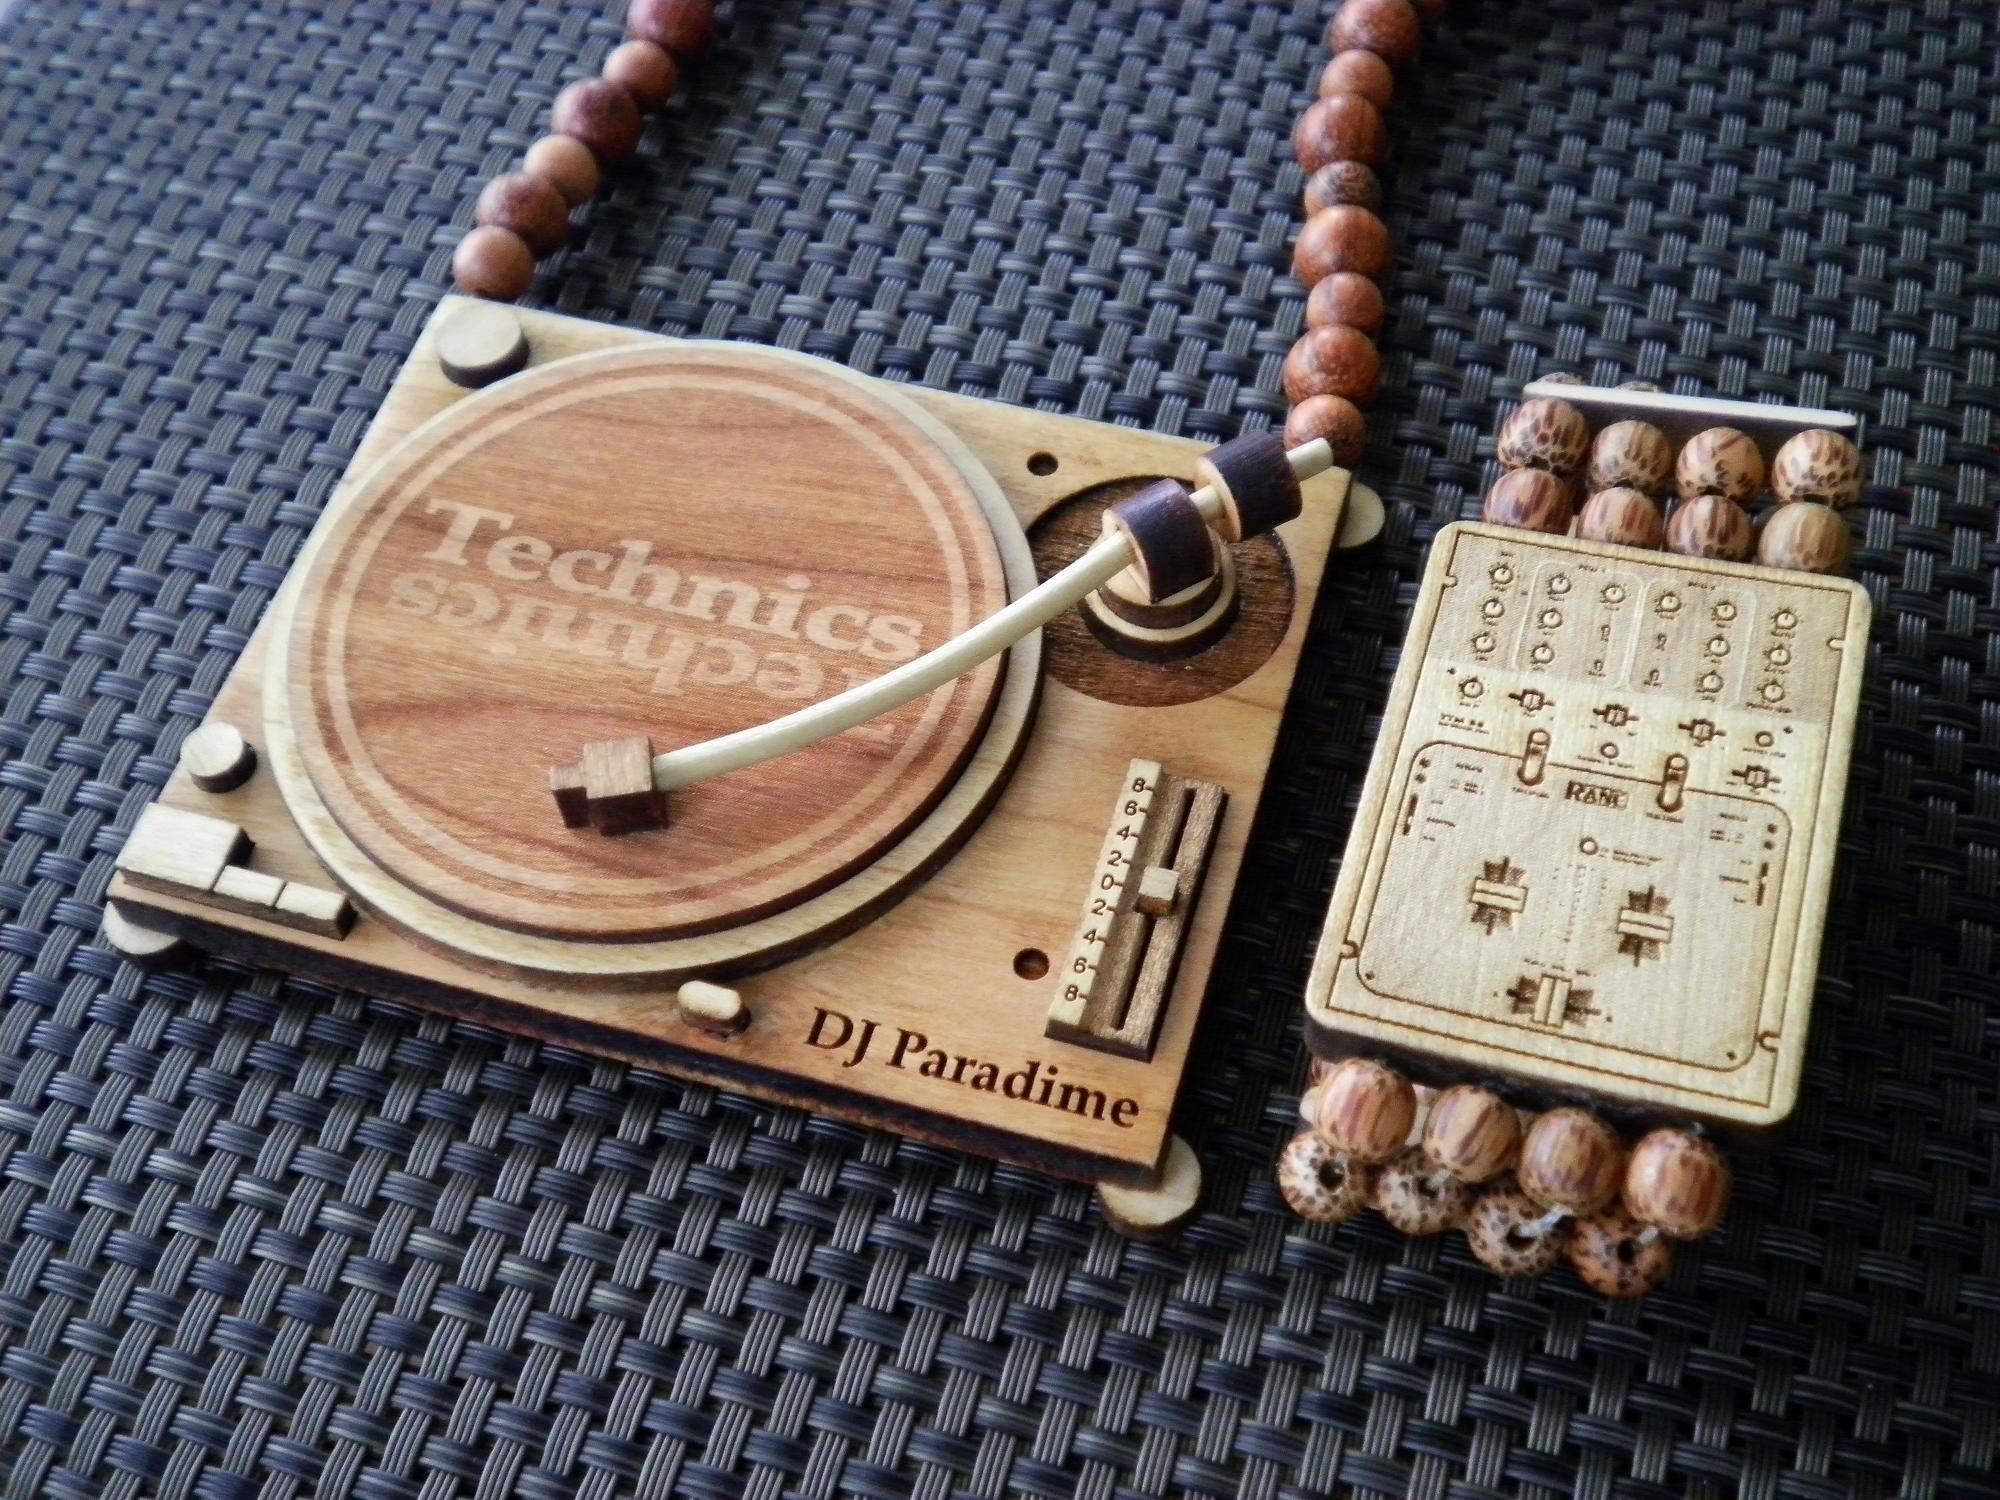 Pin By Larry Man On Diy Music Jewelry Dj Music